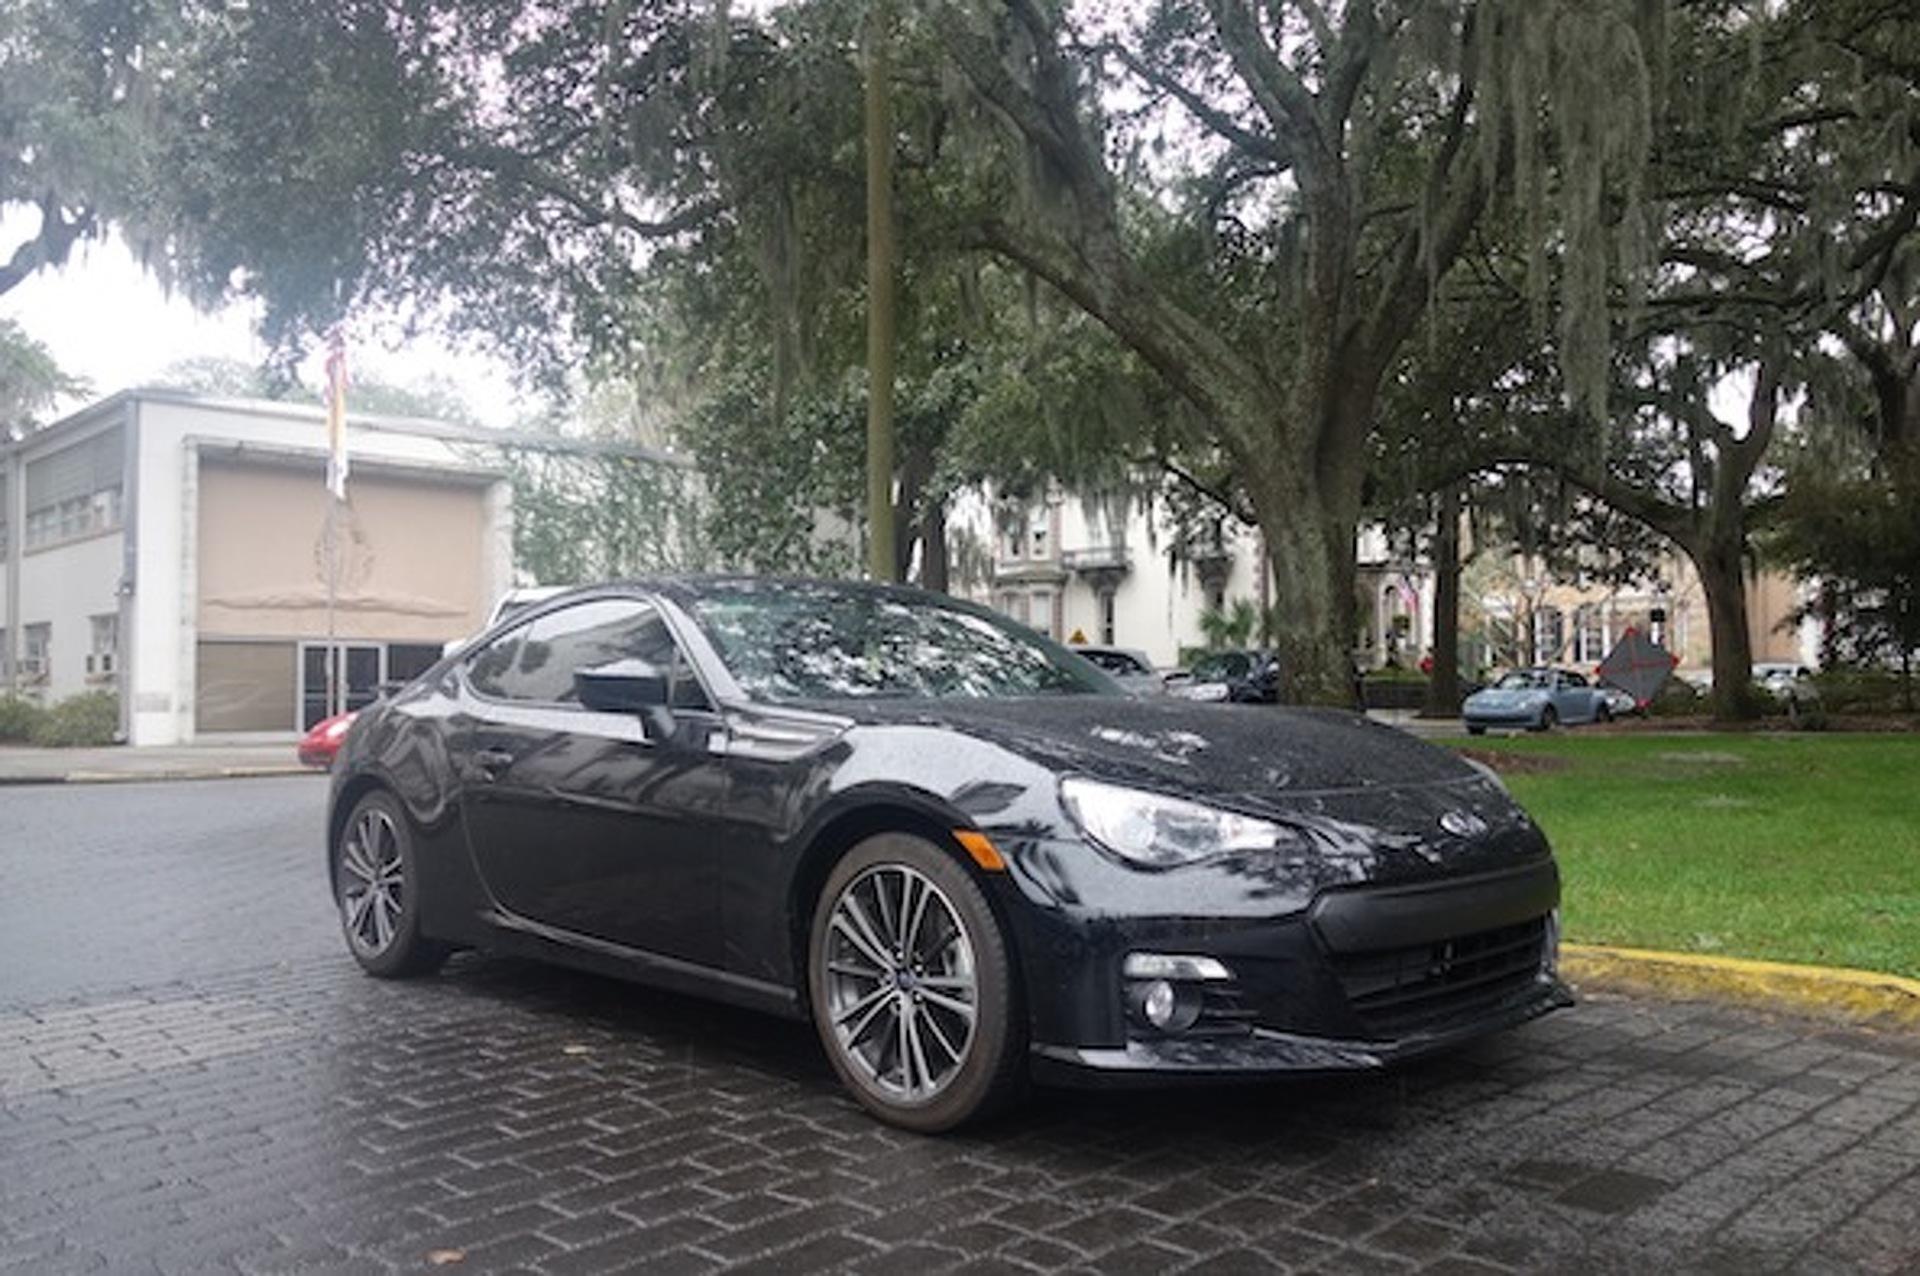 Miami to Savannah In A Subaru BRZ: Bold Drives